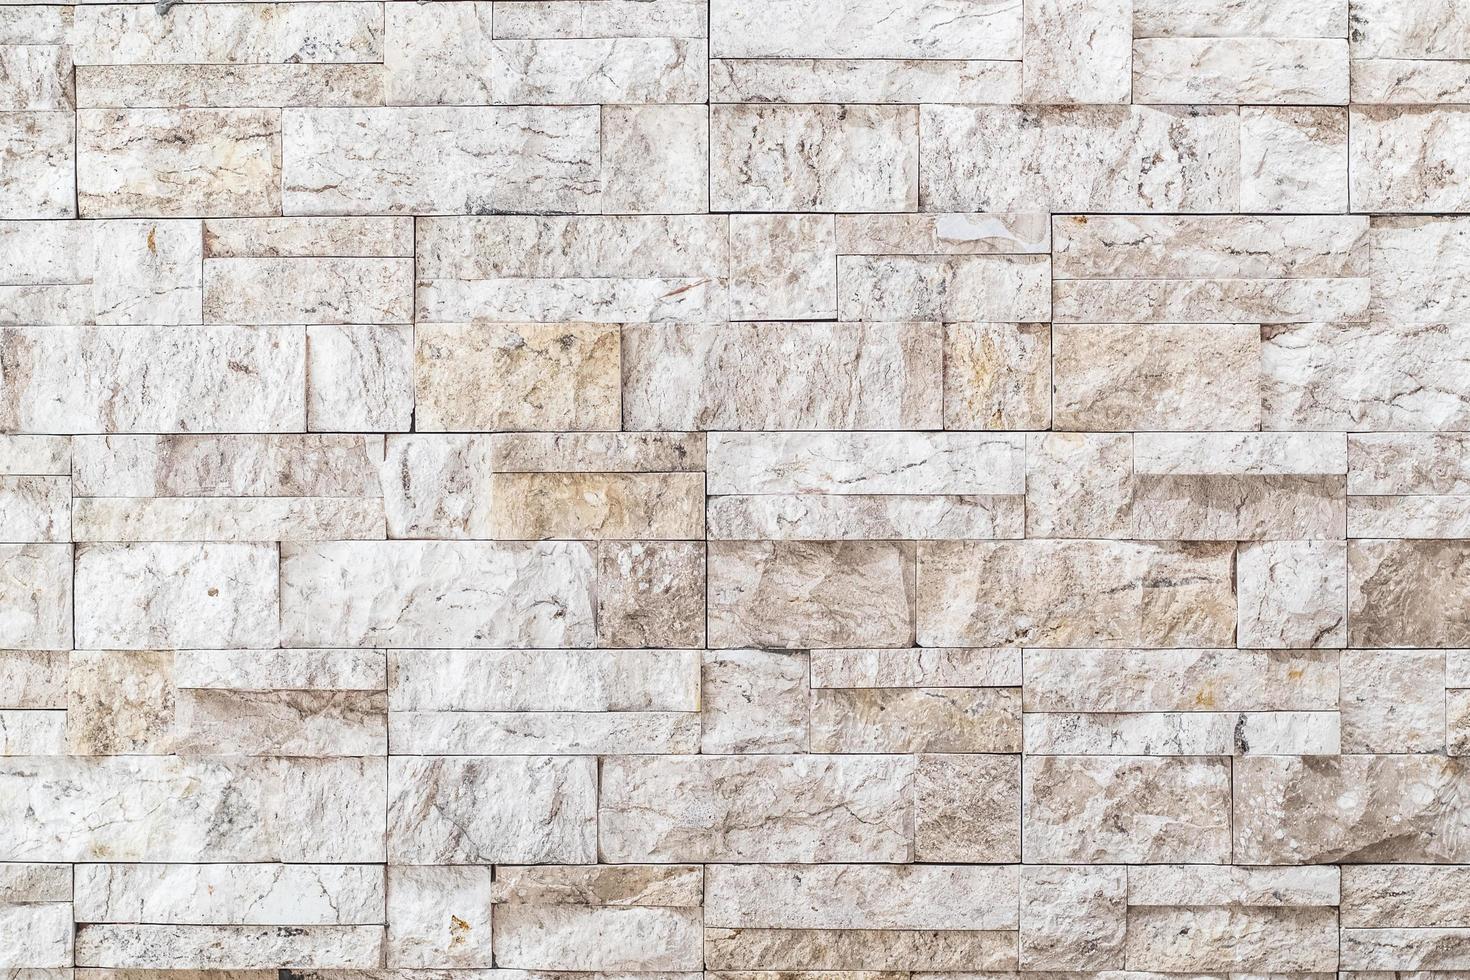 Beige sandstone wall photo